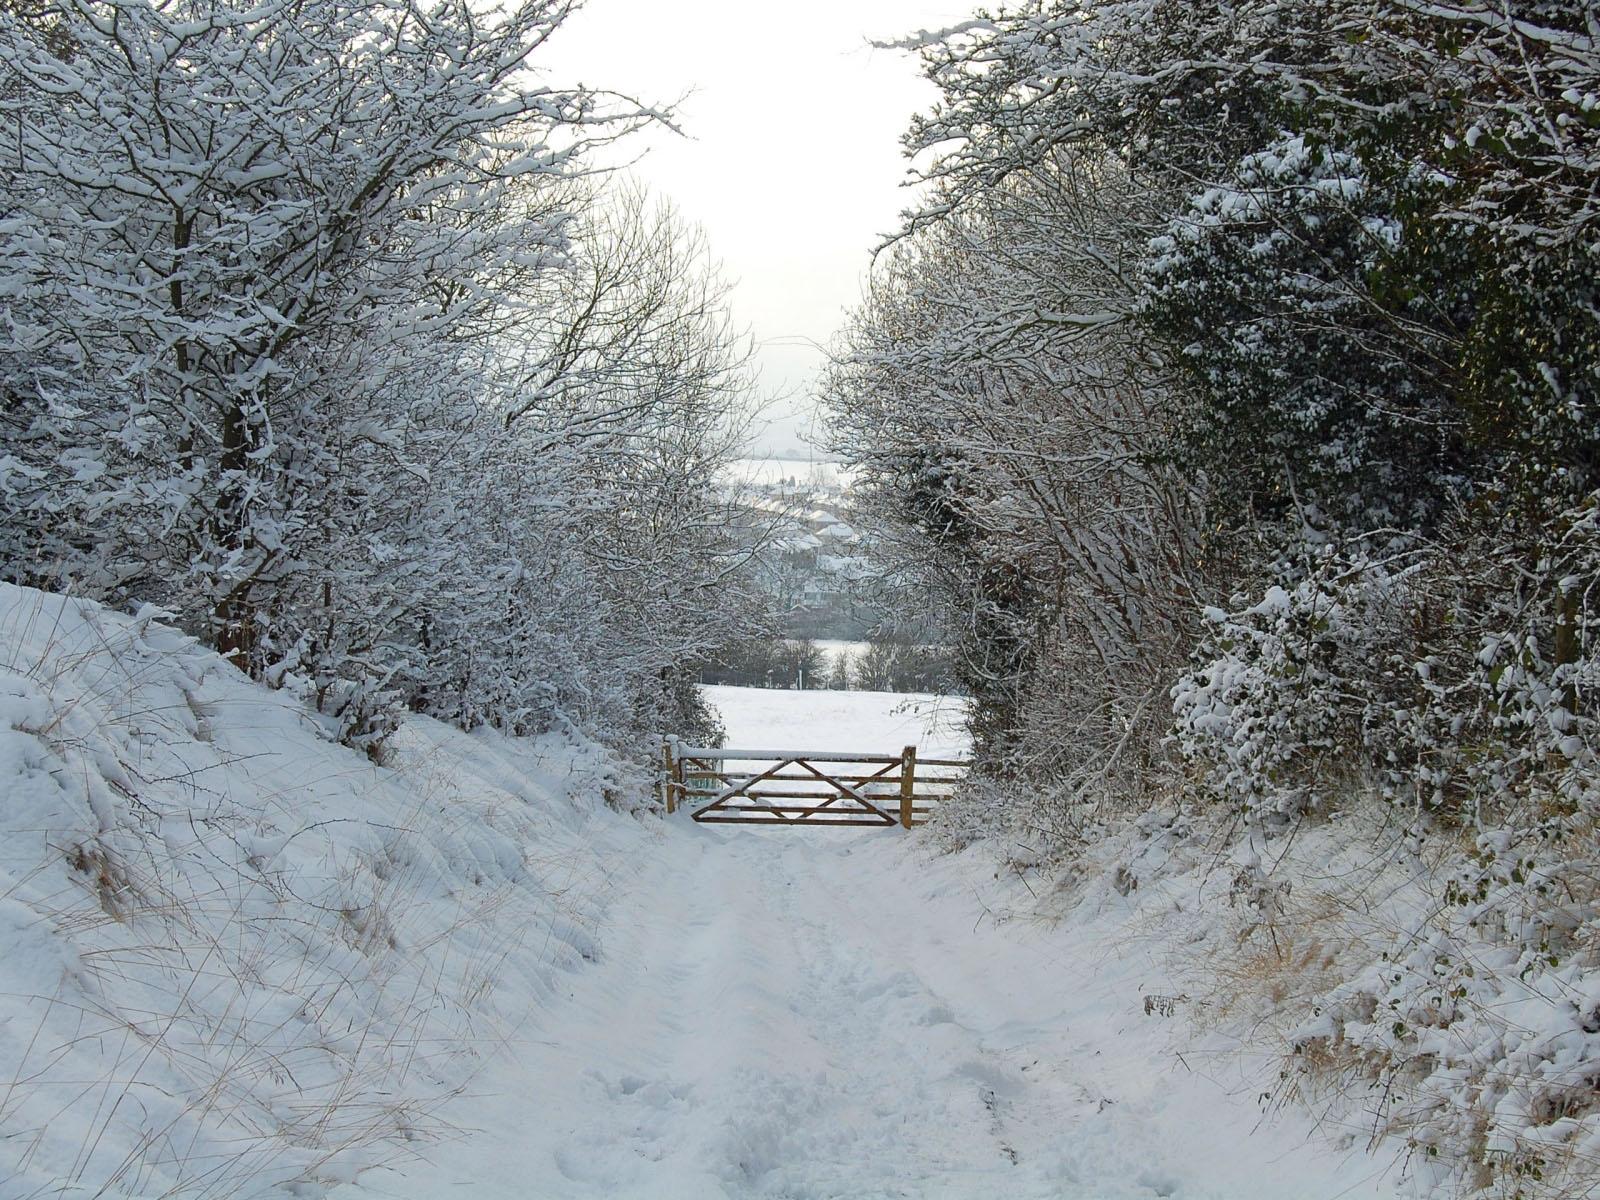 Winter Scenes Wallpaper Download wallpaper wallpaper hd 1600x1200